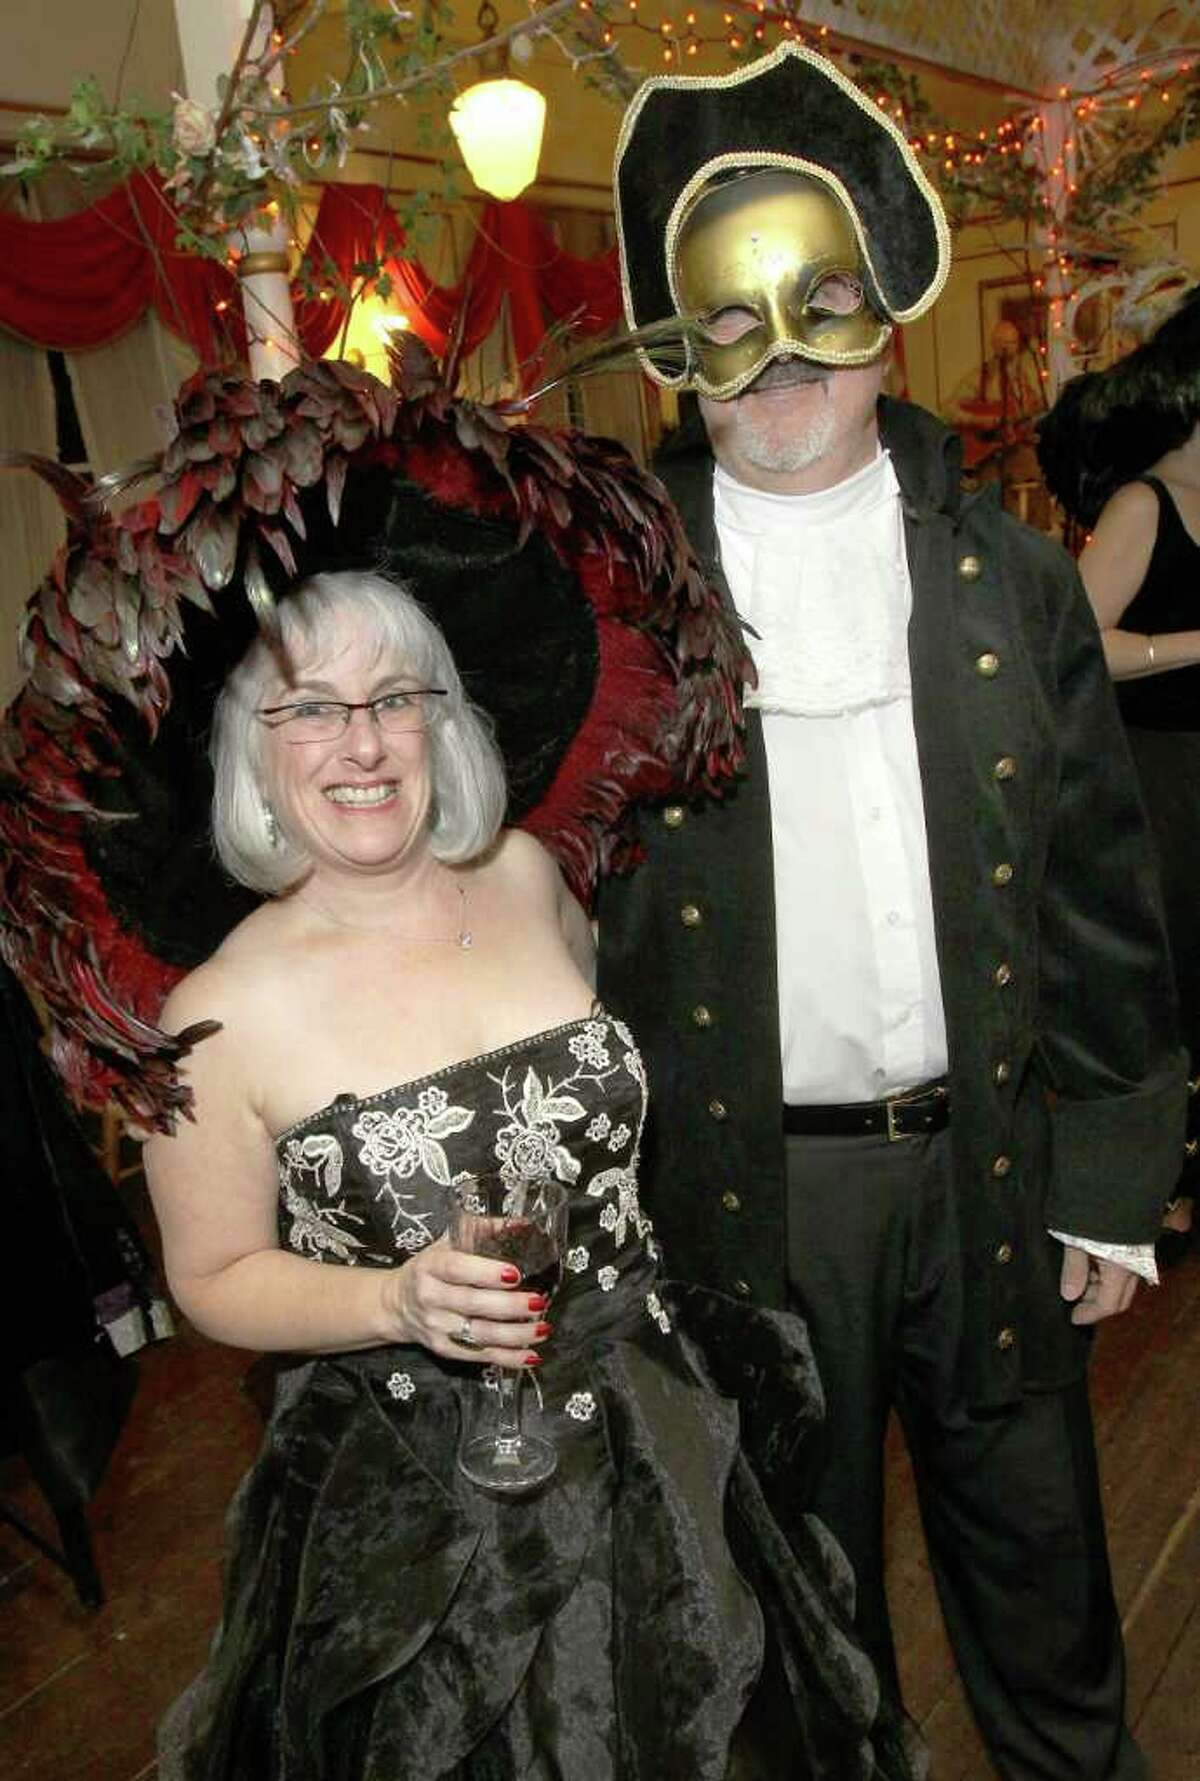 Julie Marks, the co-founder of ASPIRe N.Y., and her husband, Steve Marks. (Joe Putrock)